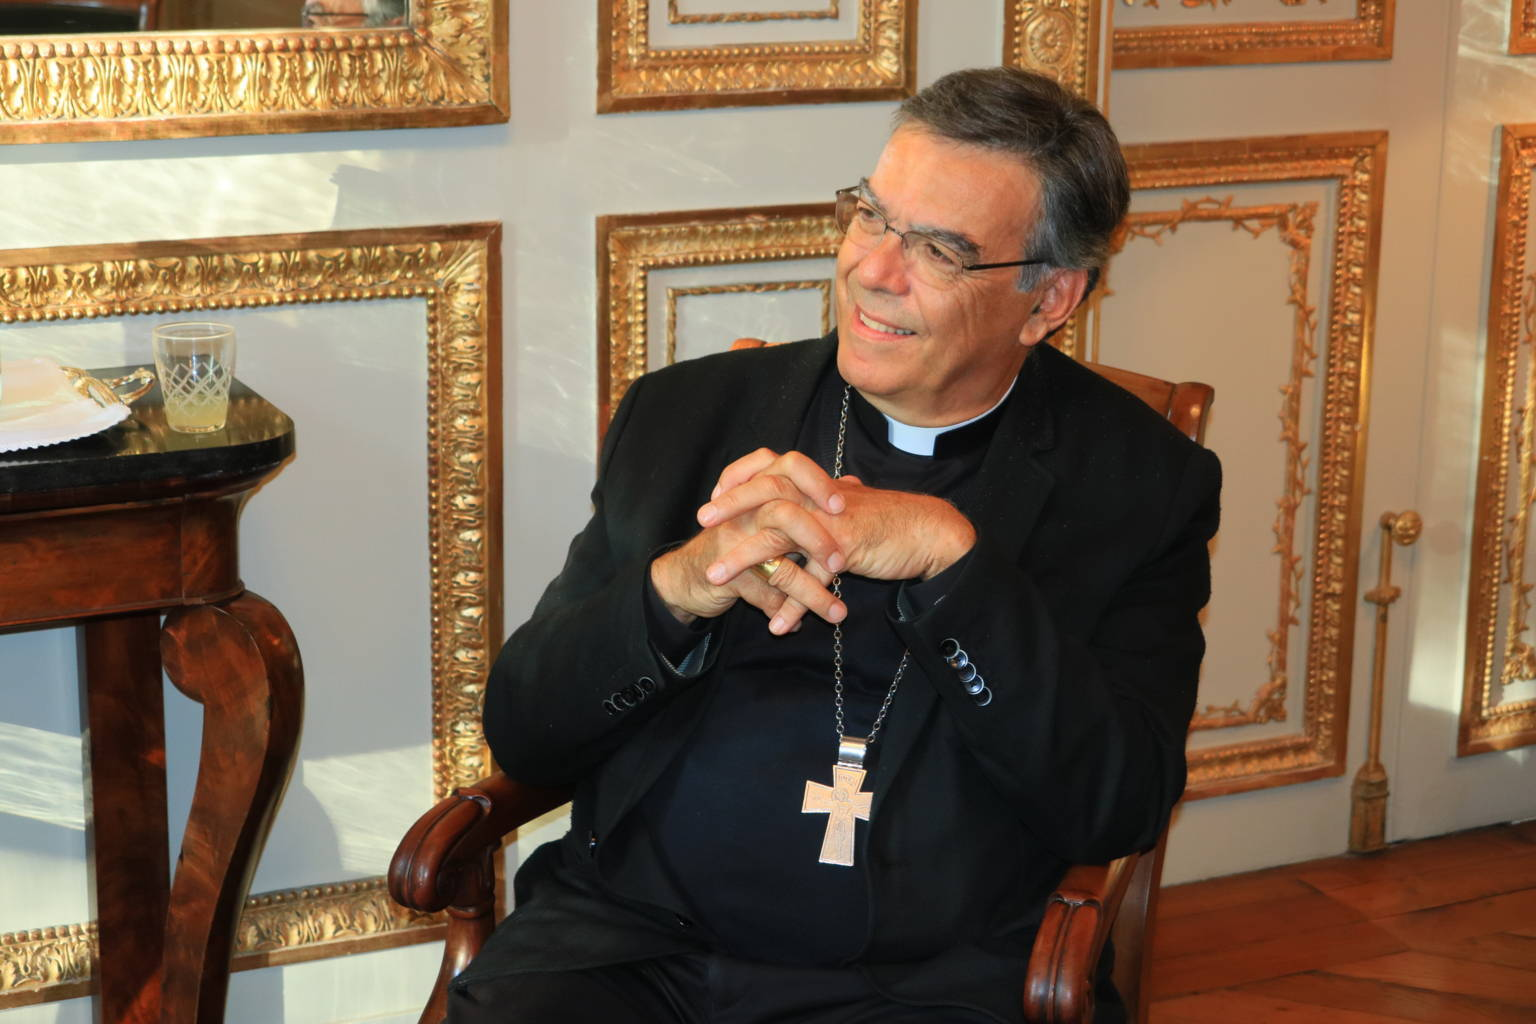 IMG 0309 - Συνάντηση του Μητροπολίτη Γαλλίας με τον ΡωμαιοκαθολικόΑρχιεπίσκοπο Παρισίων